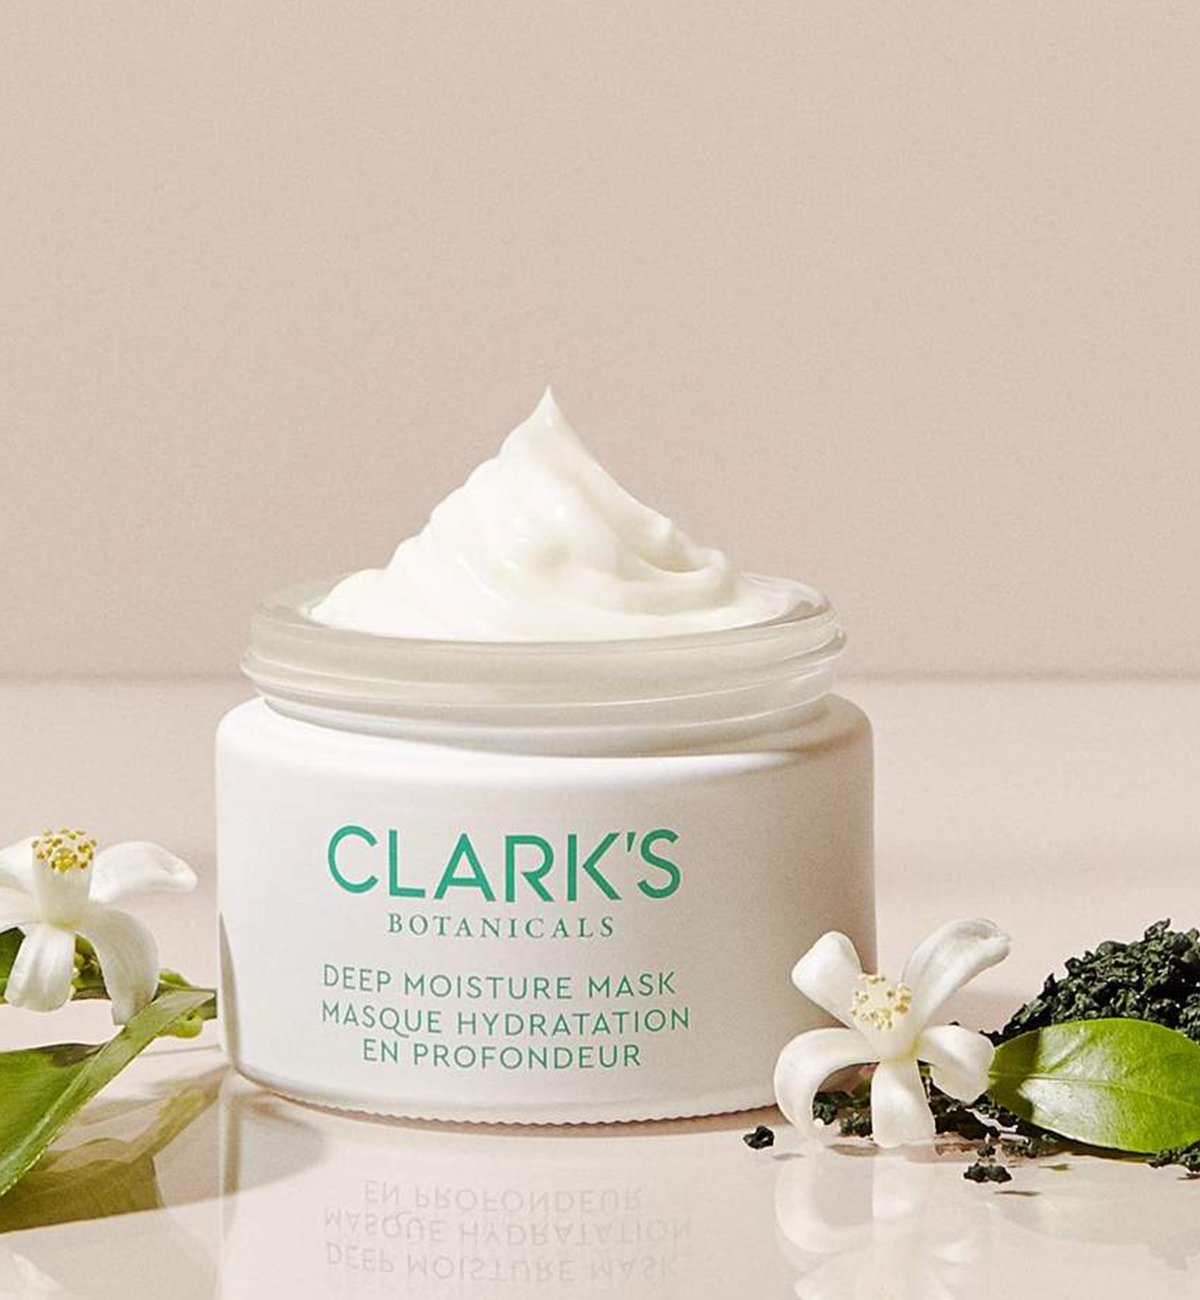 Click here to shop the Clark's Botanicals Deep Moisture Mask